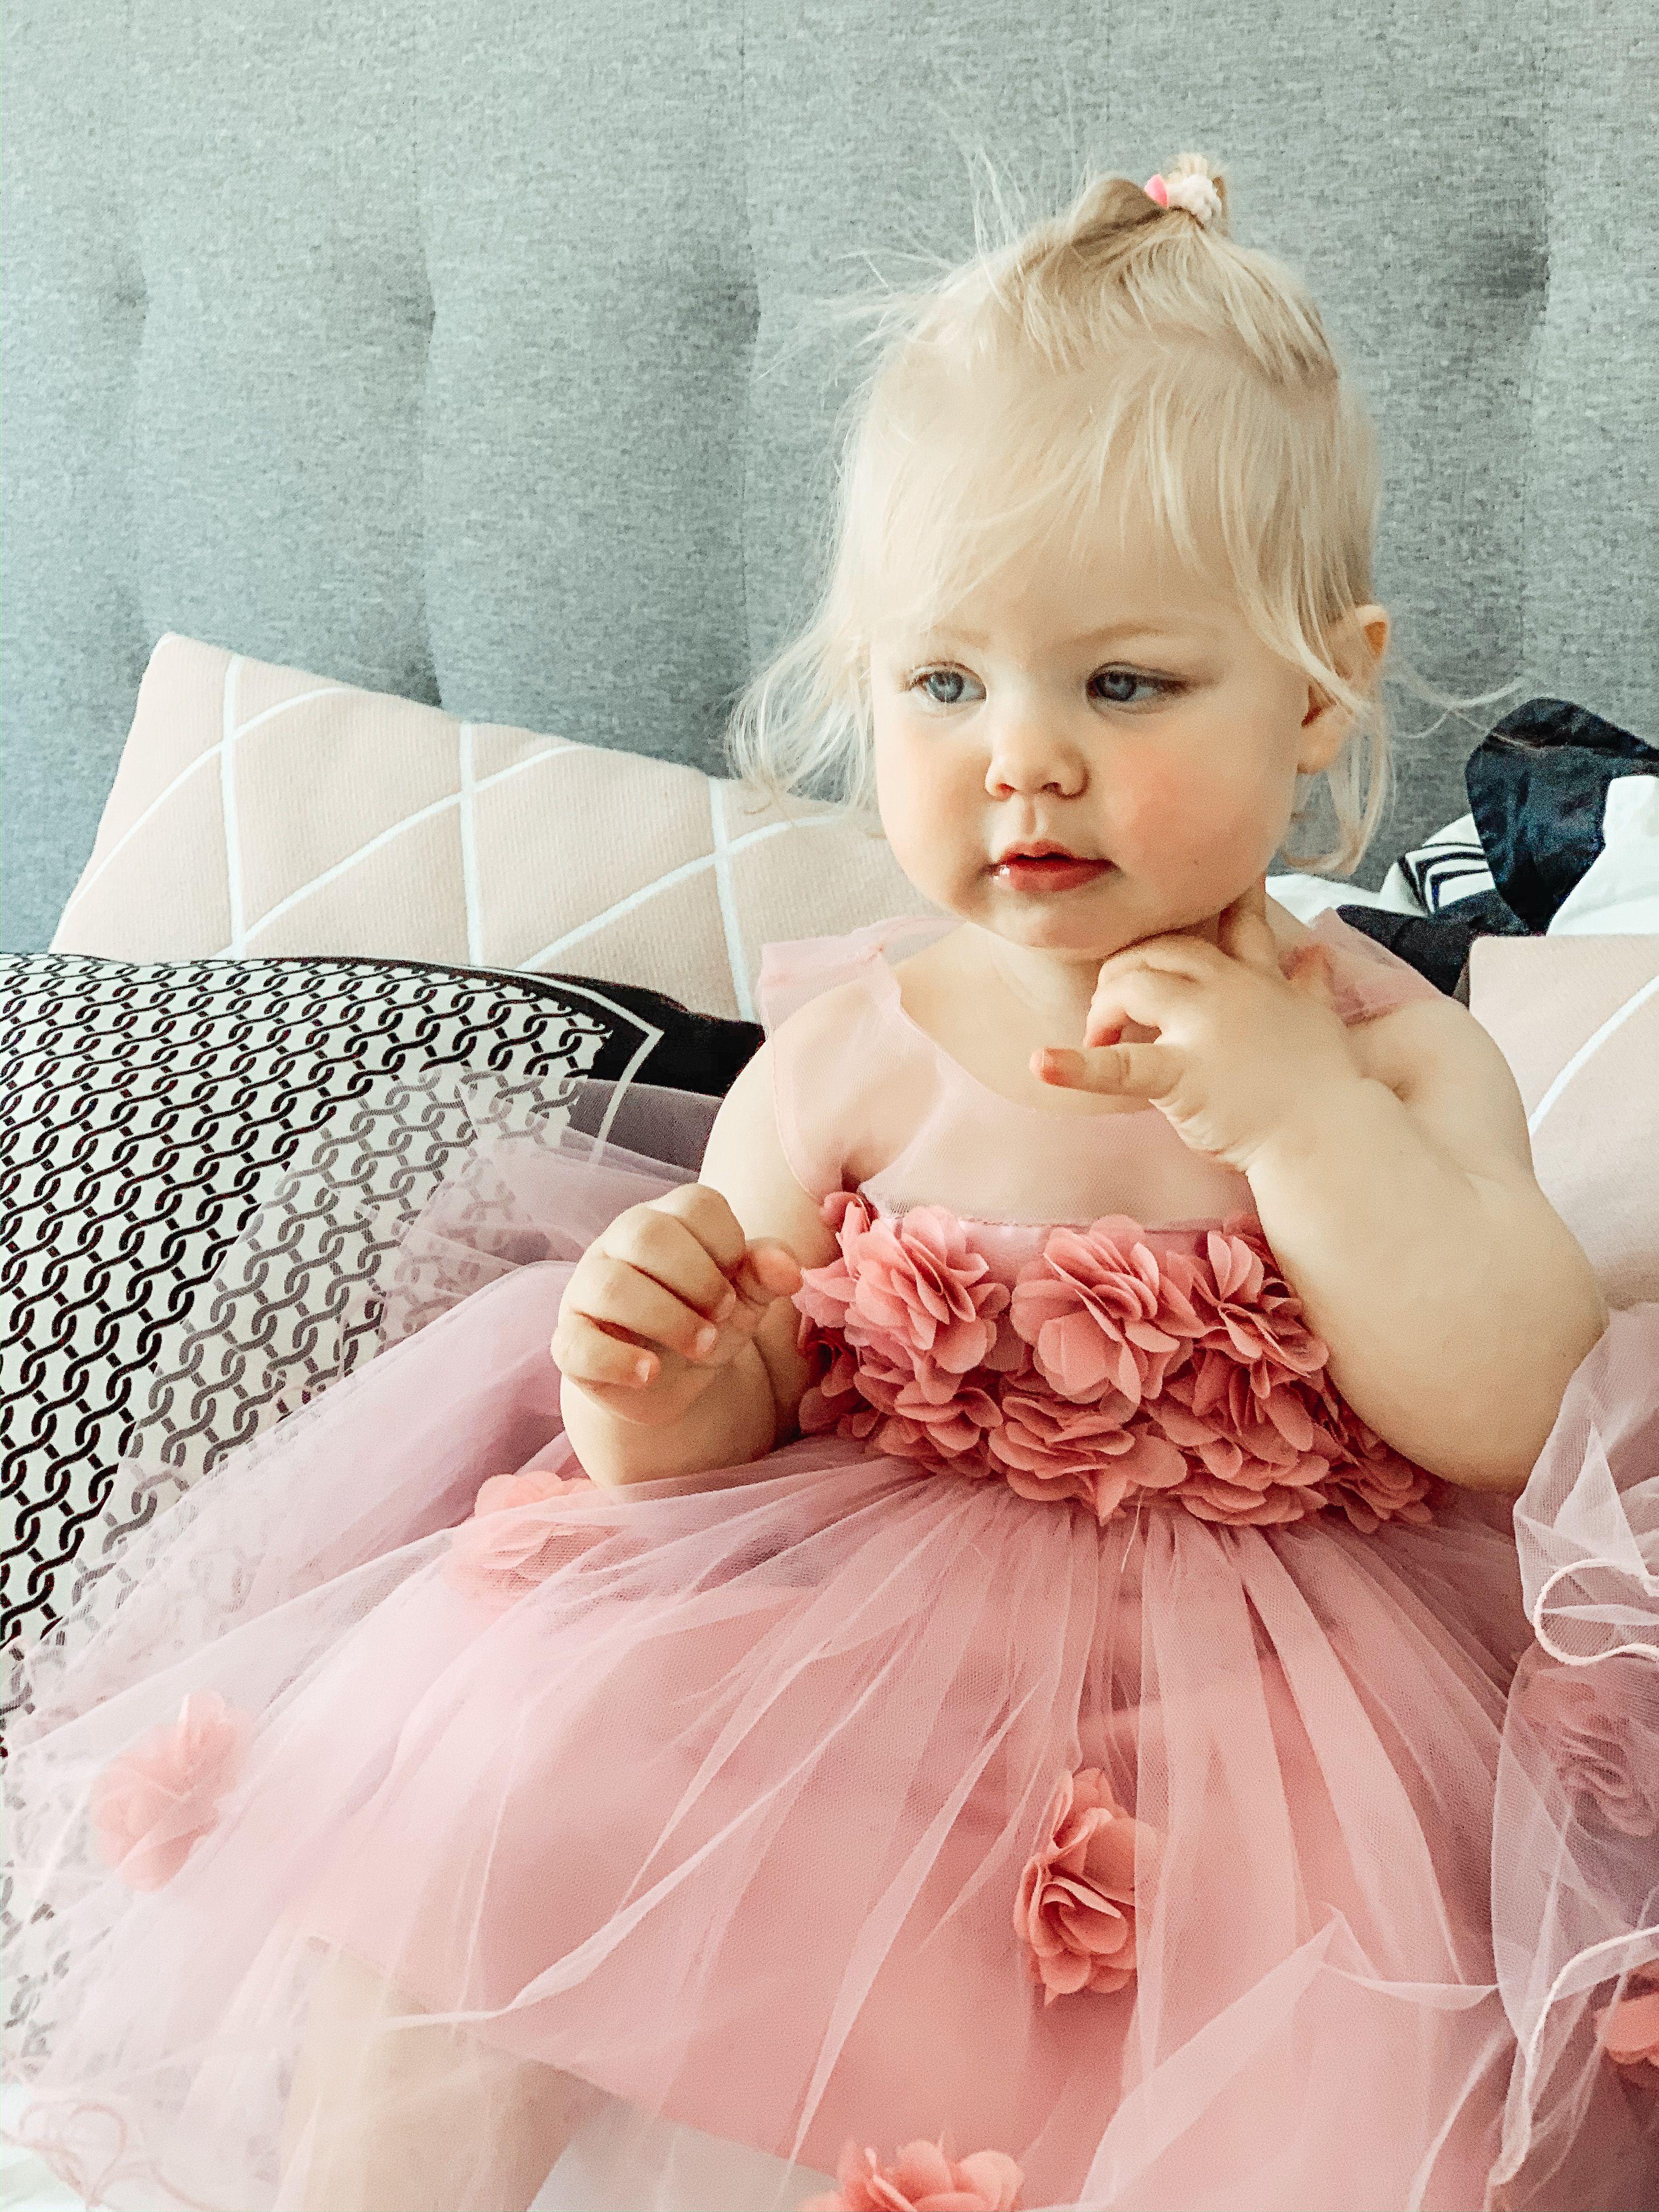 Cutest baby girl ever princess dress  Birthday girl dress, 6st